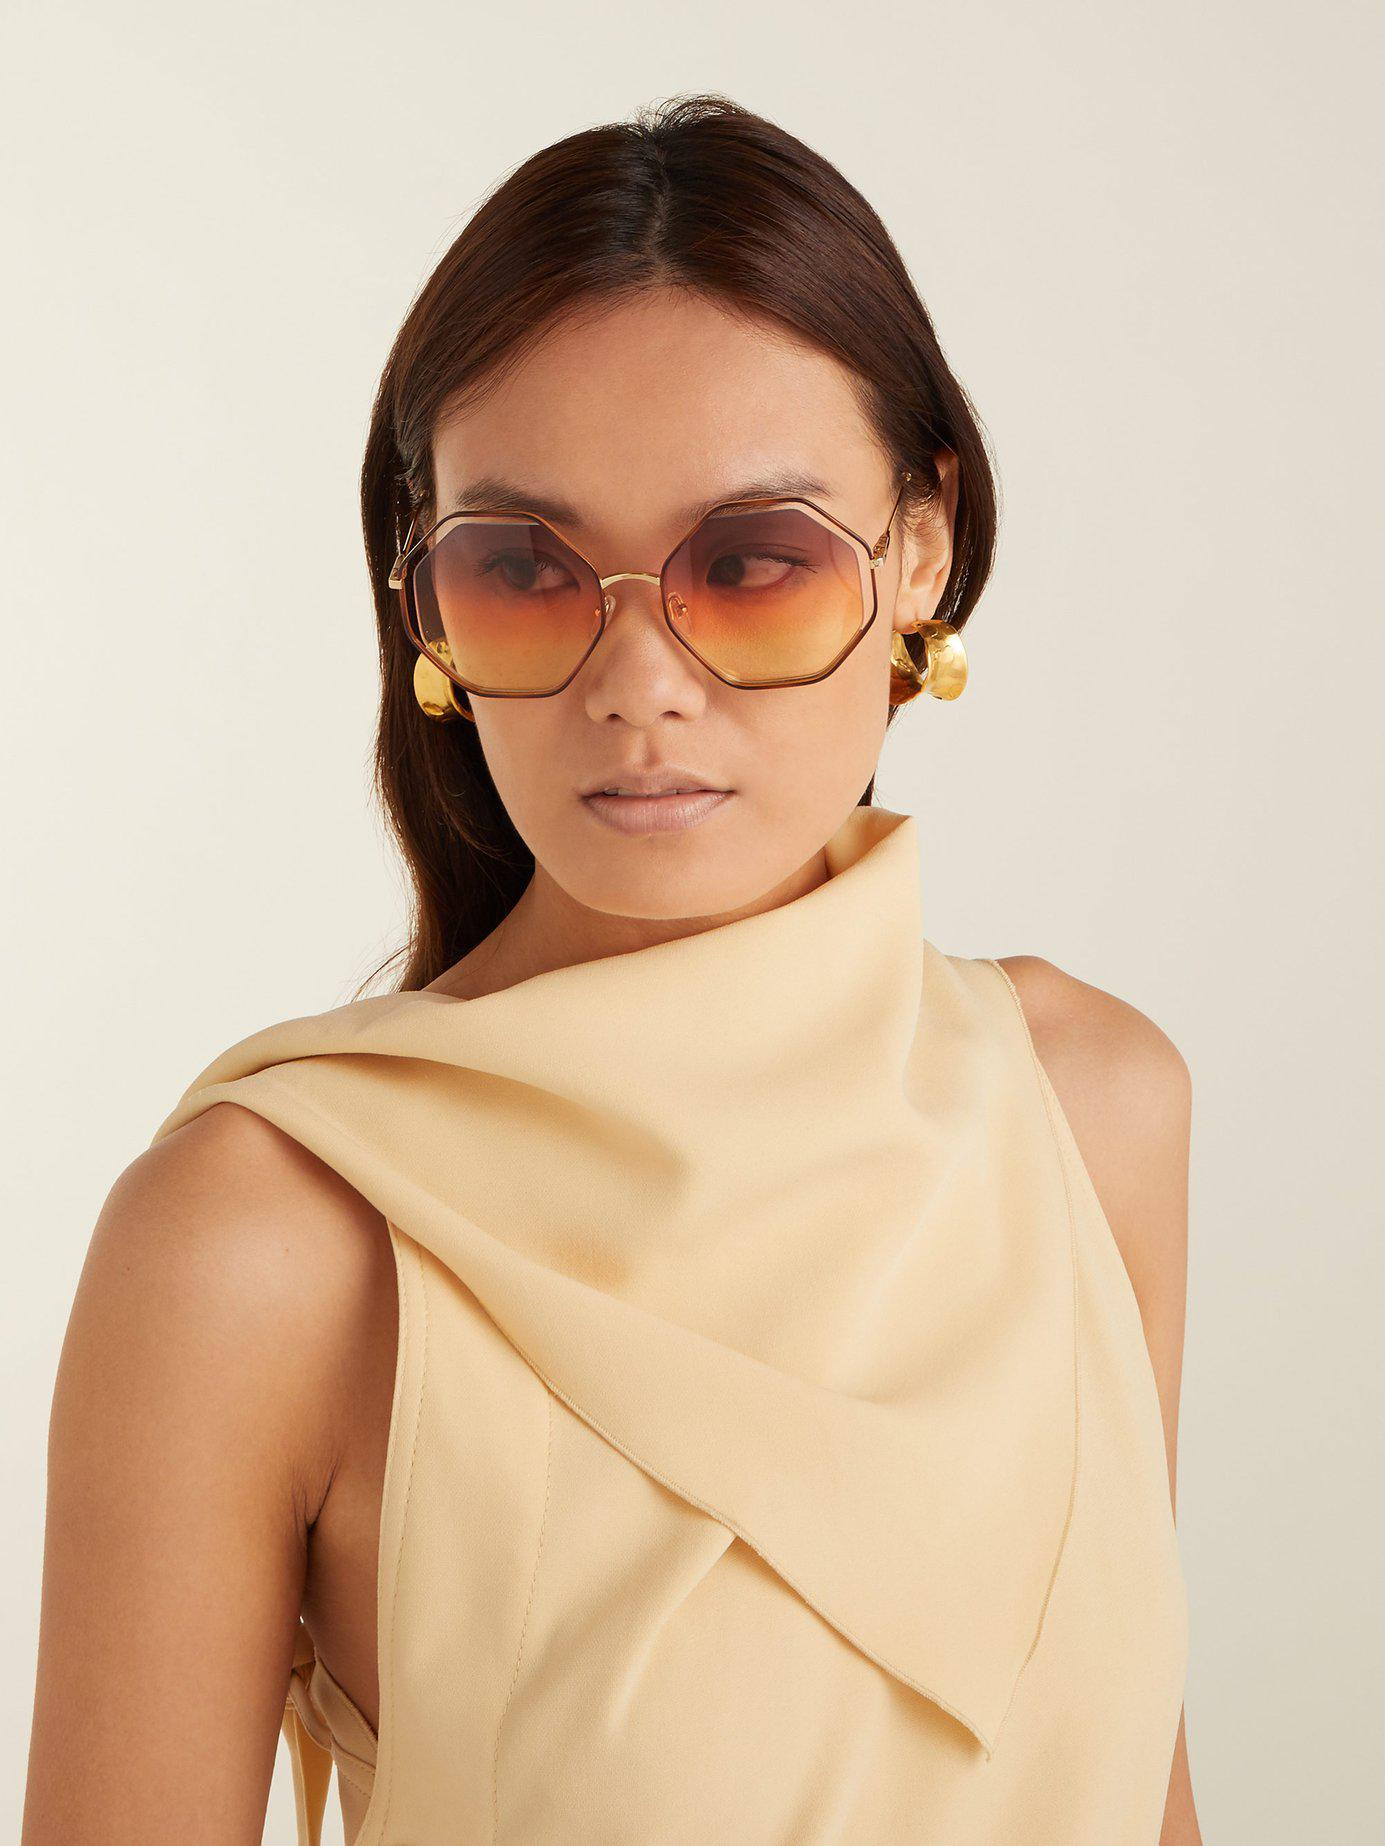 53edccf5130 Lyst - Chloé Poppy Octagon Frame Sunglasses in Brown - Save 10%